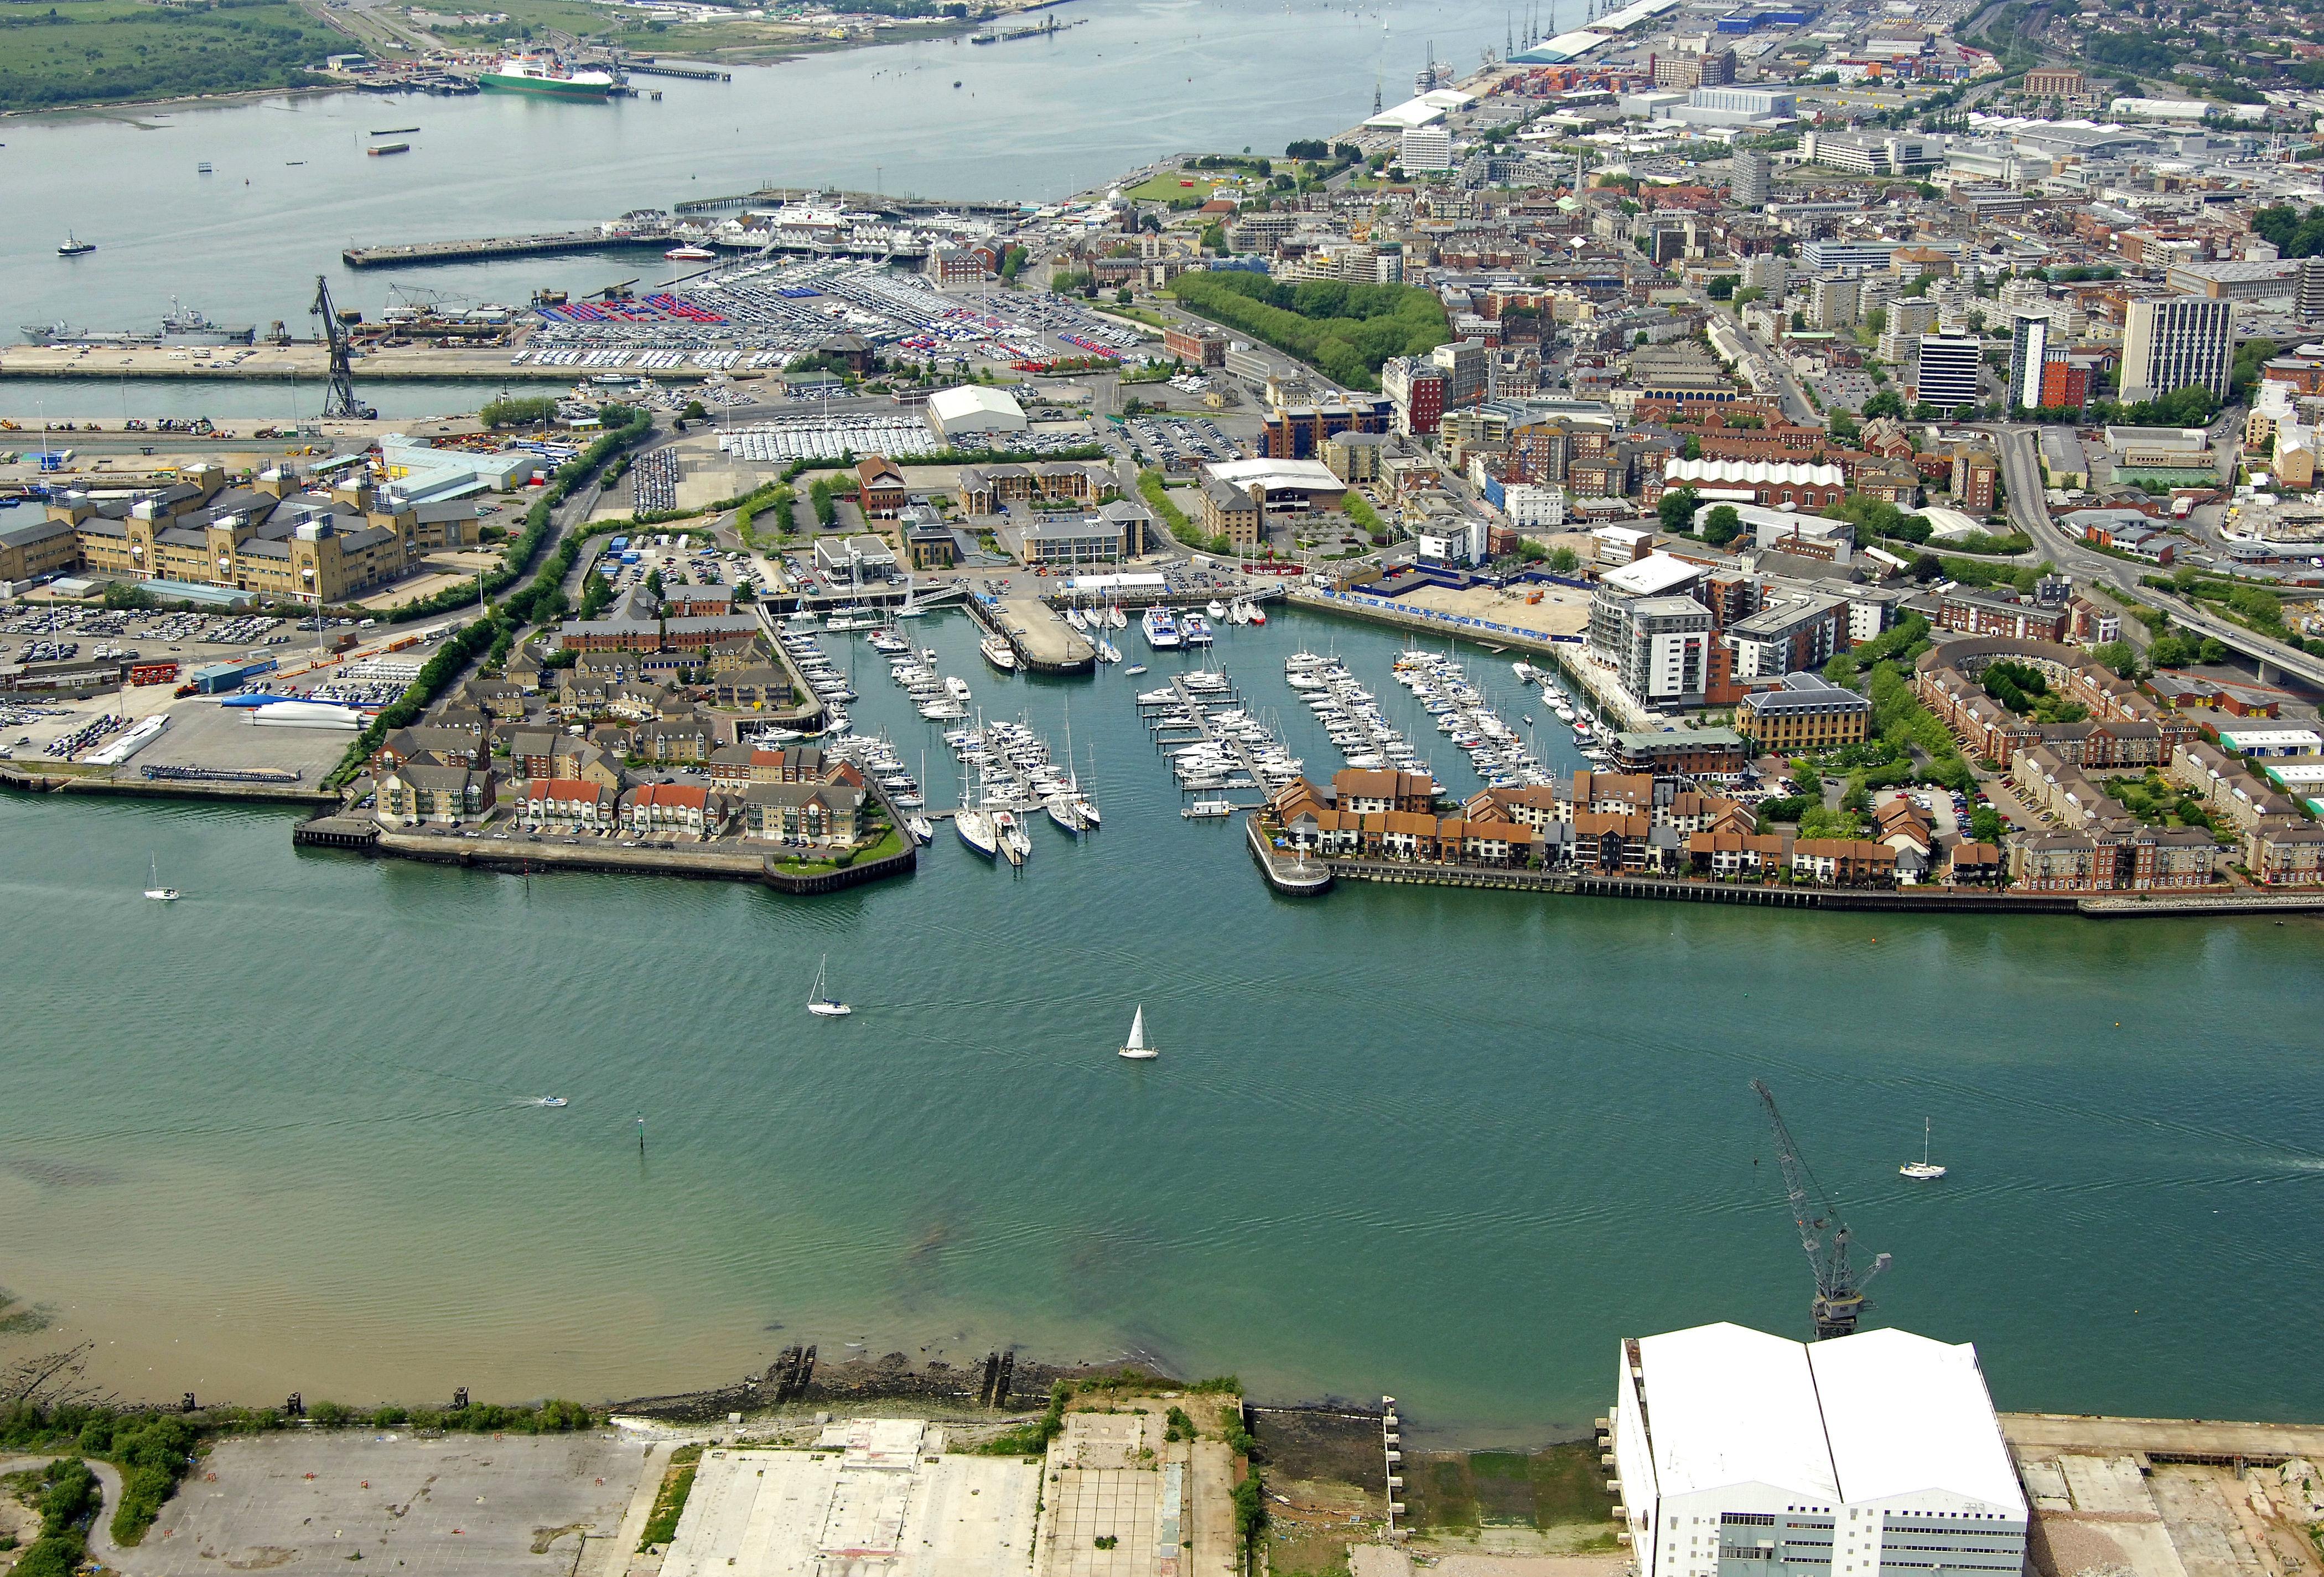 Ocean Village Marina in Southampton, Hampshire, GB, United Kingdom ...